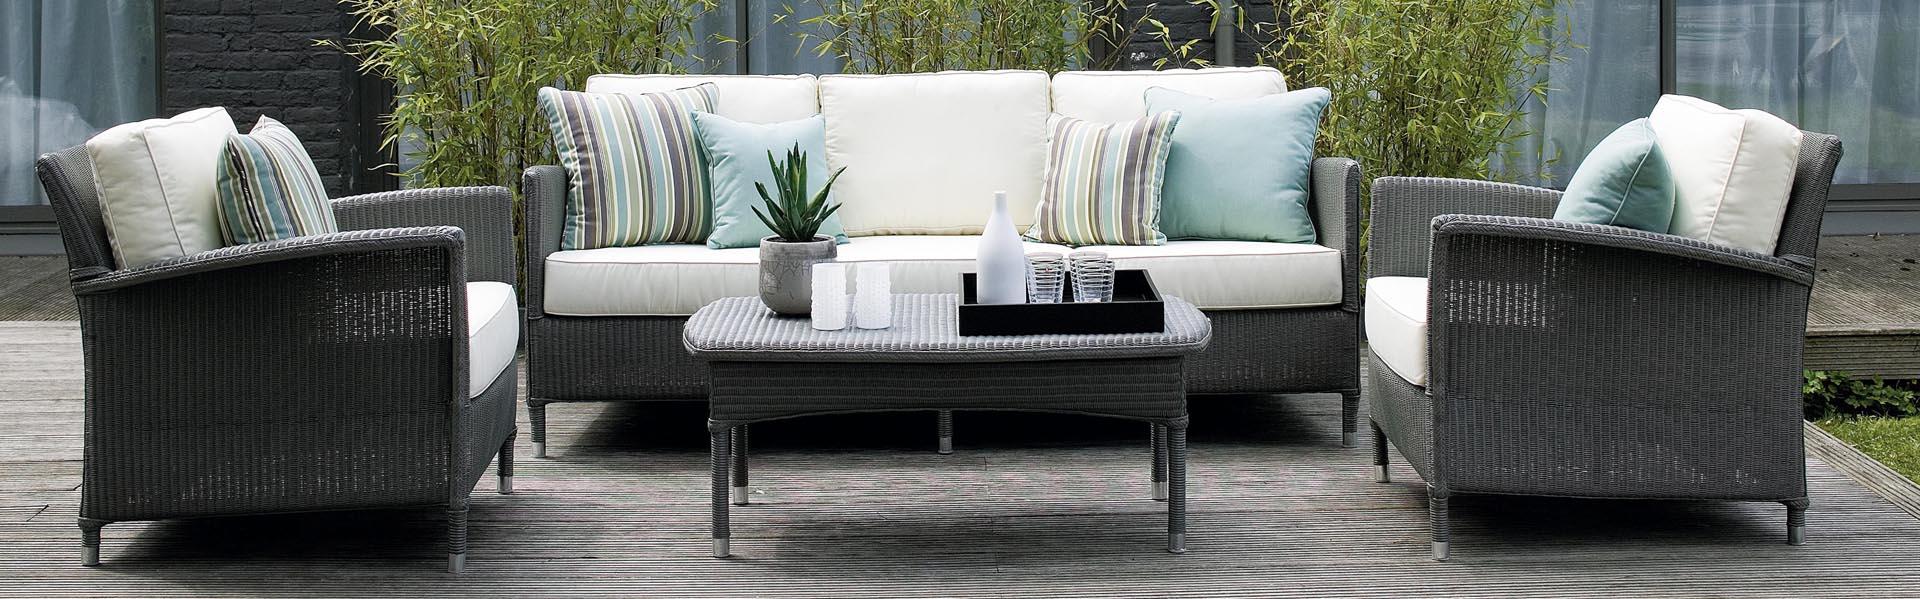 loom m bel von vincent sheppard und maritime stoffe von nya nordiska. Black Bedroom Furniture Sets. Home Design Ideas